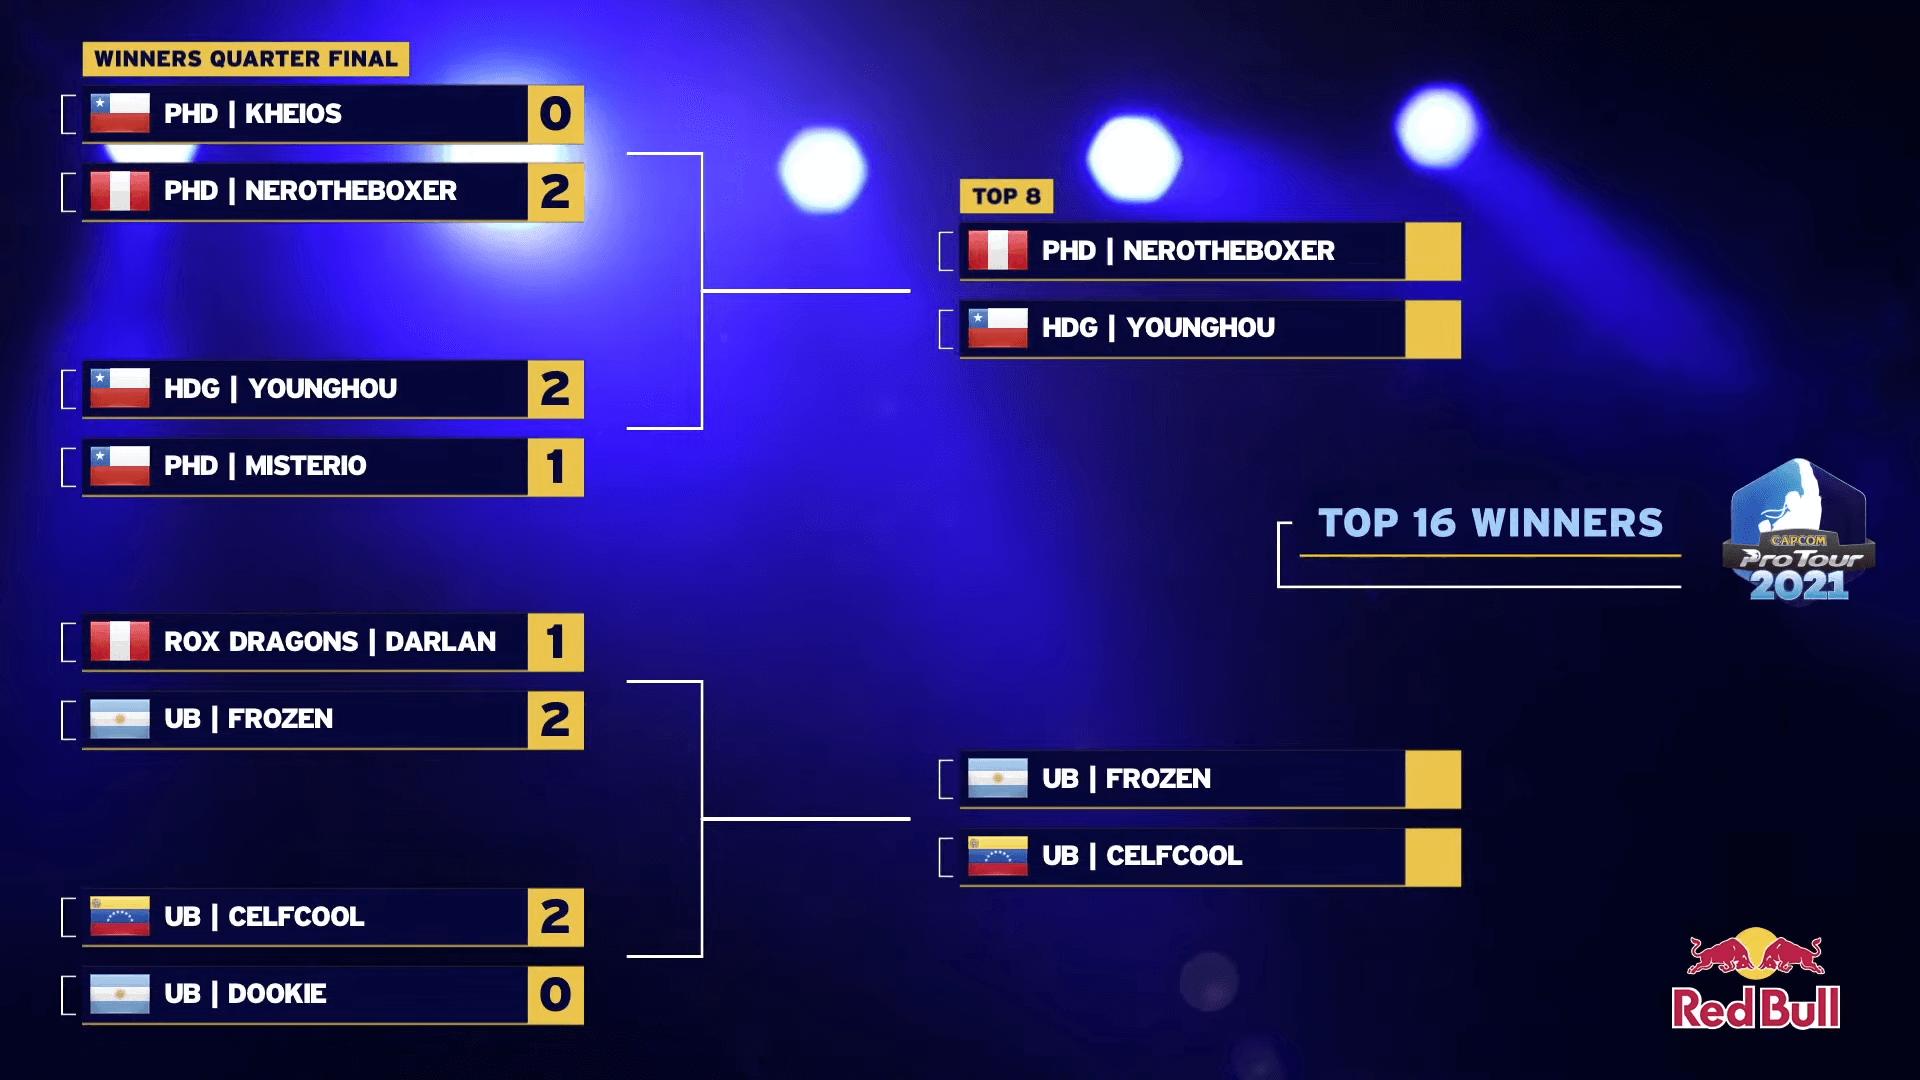 CPT 2021 — South America West, Top 16 Winner brackets